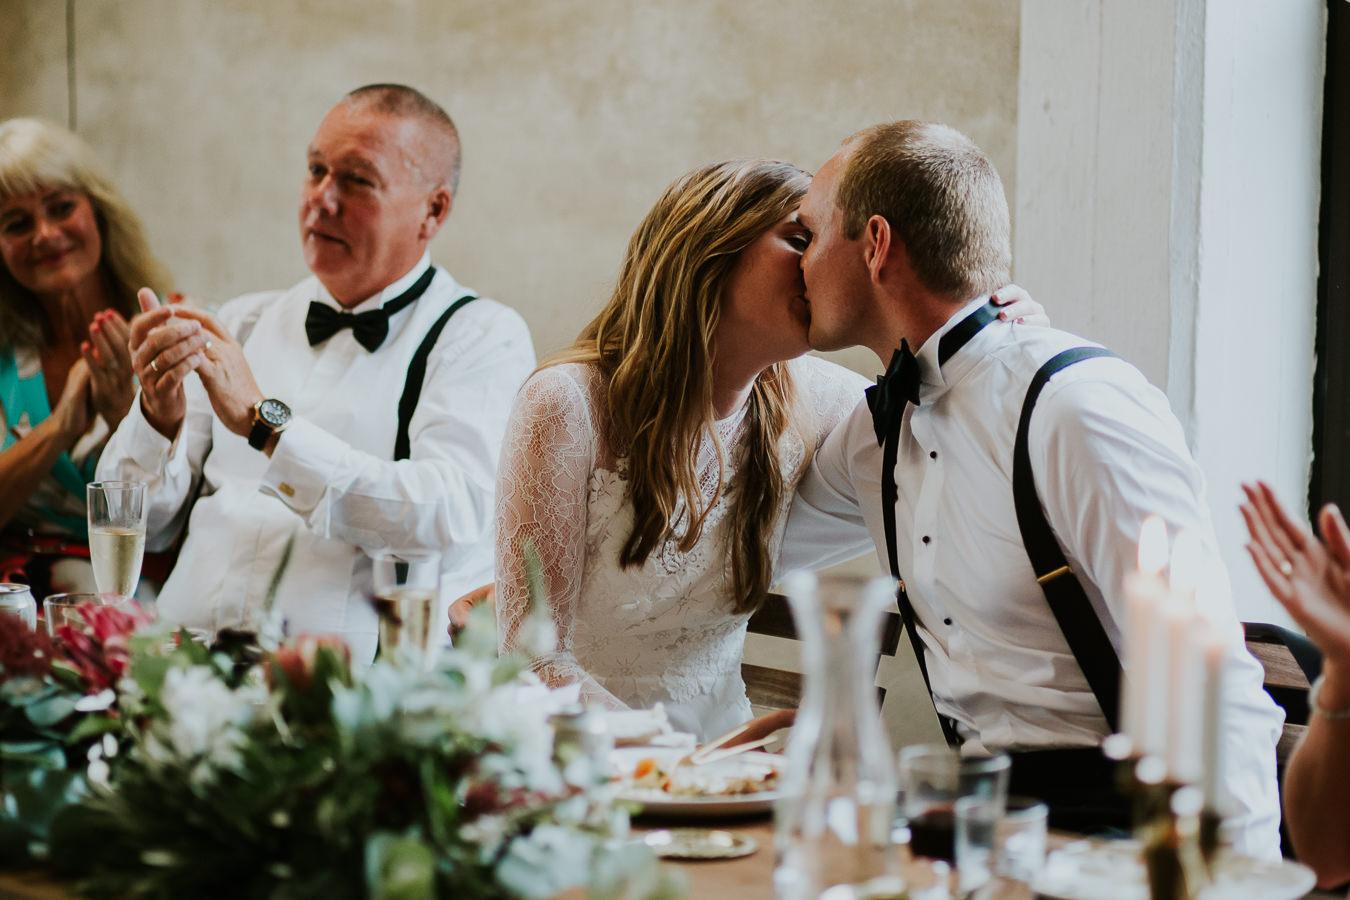 Bryllup-Lageret-Tofte-bryllupsfotograf-168.jpg